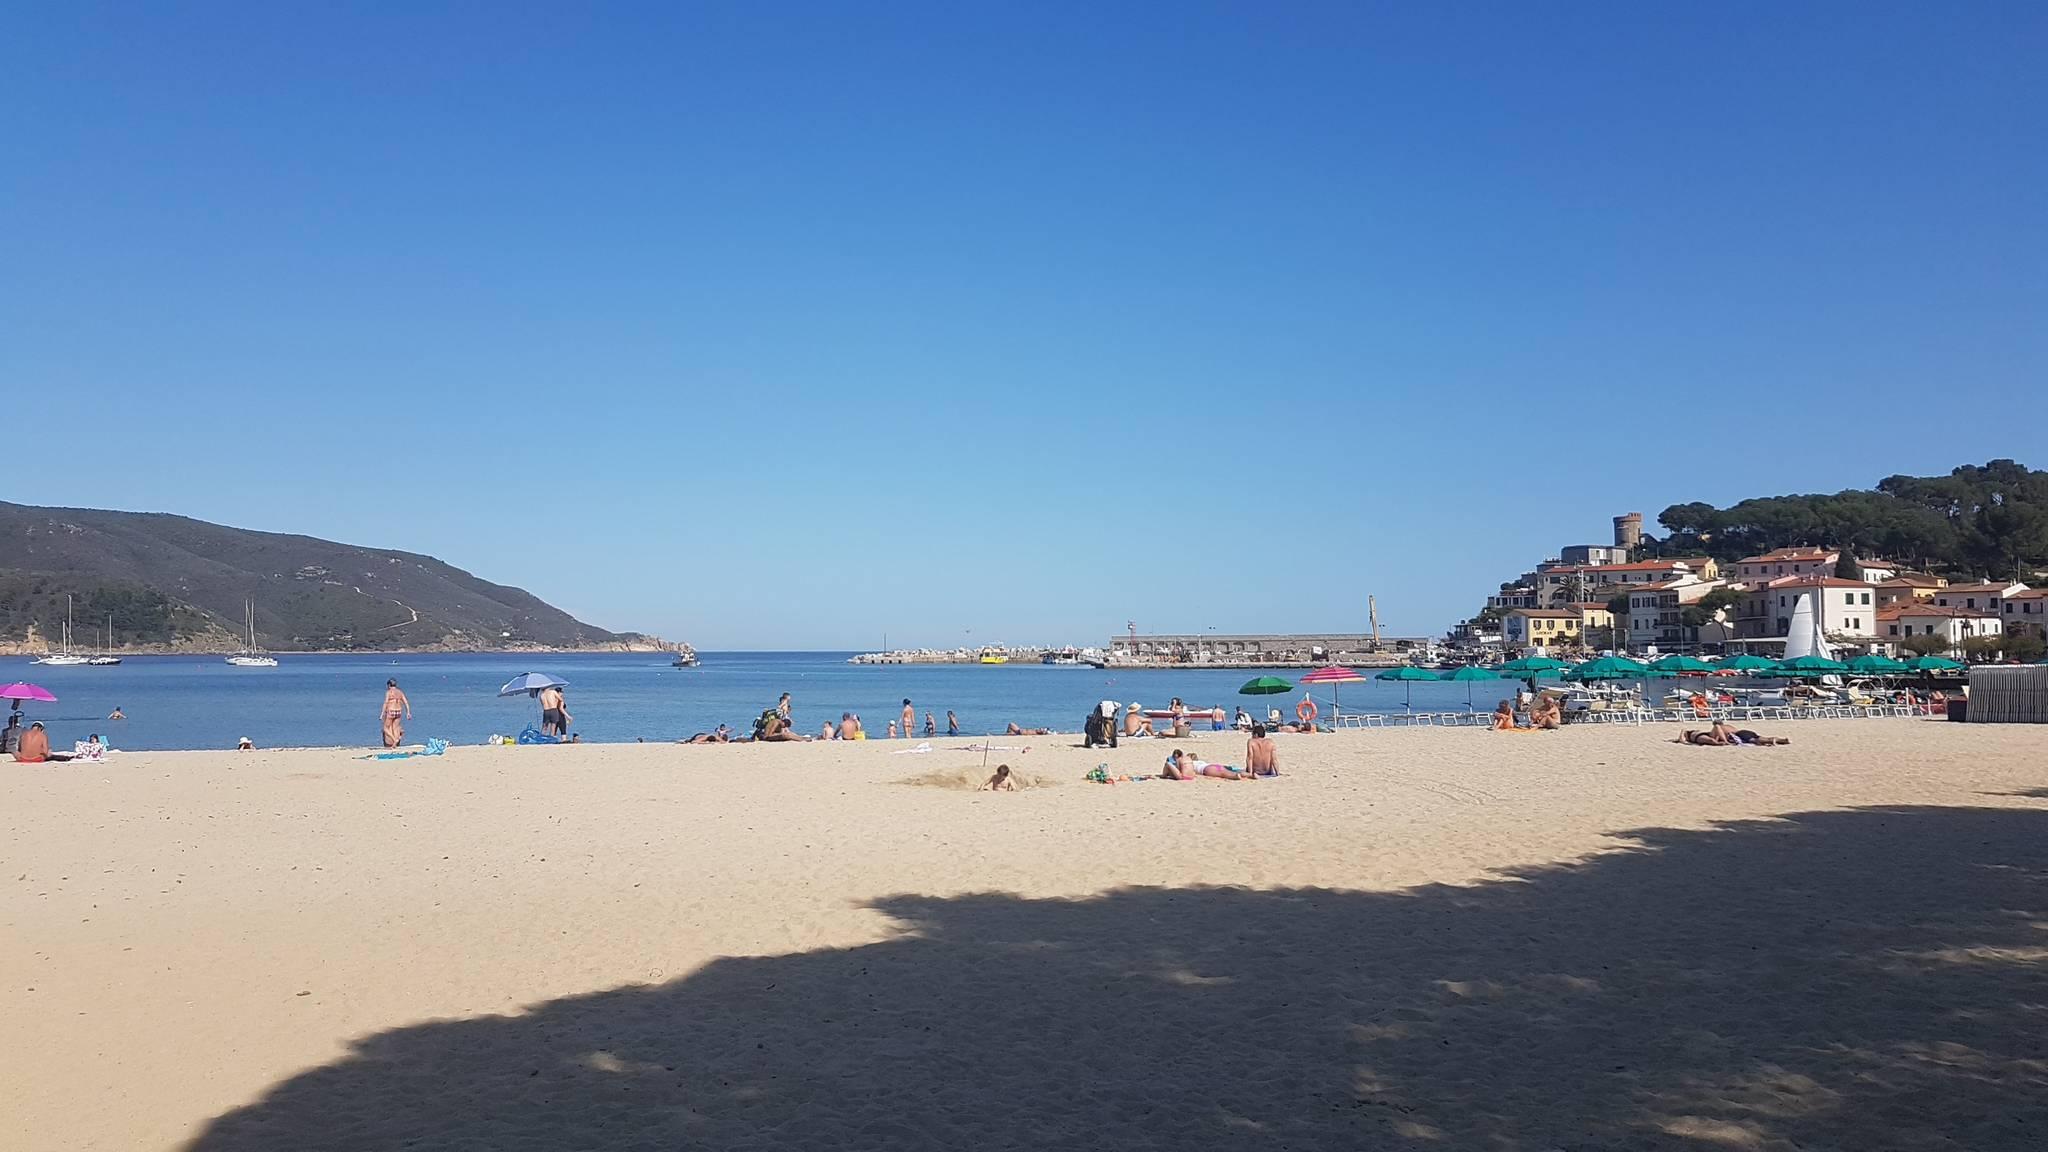 Isola d'Elba Ovest marina di Campo2